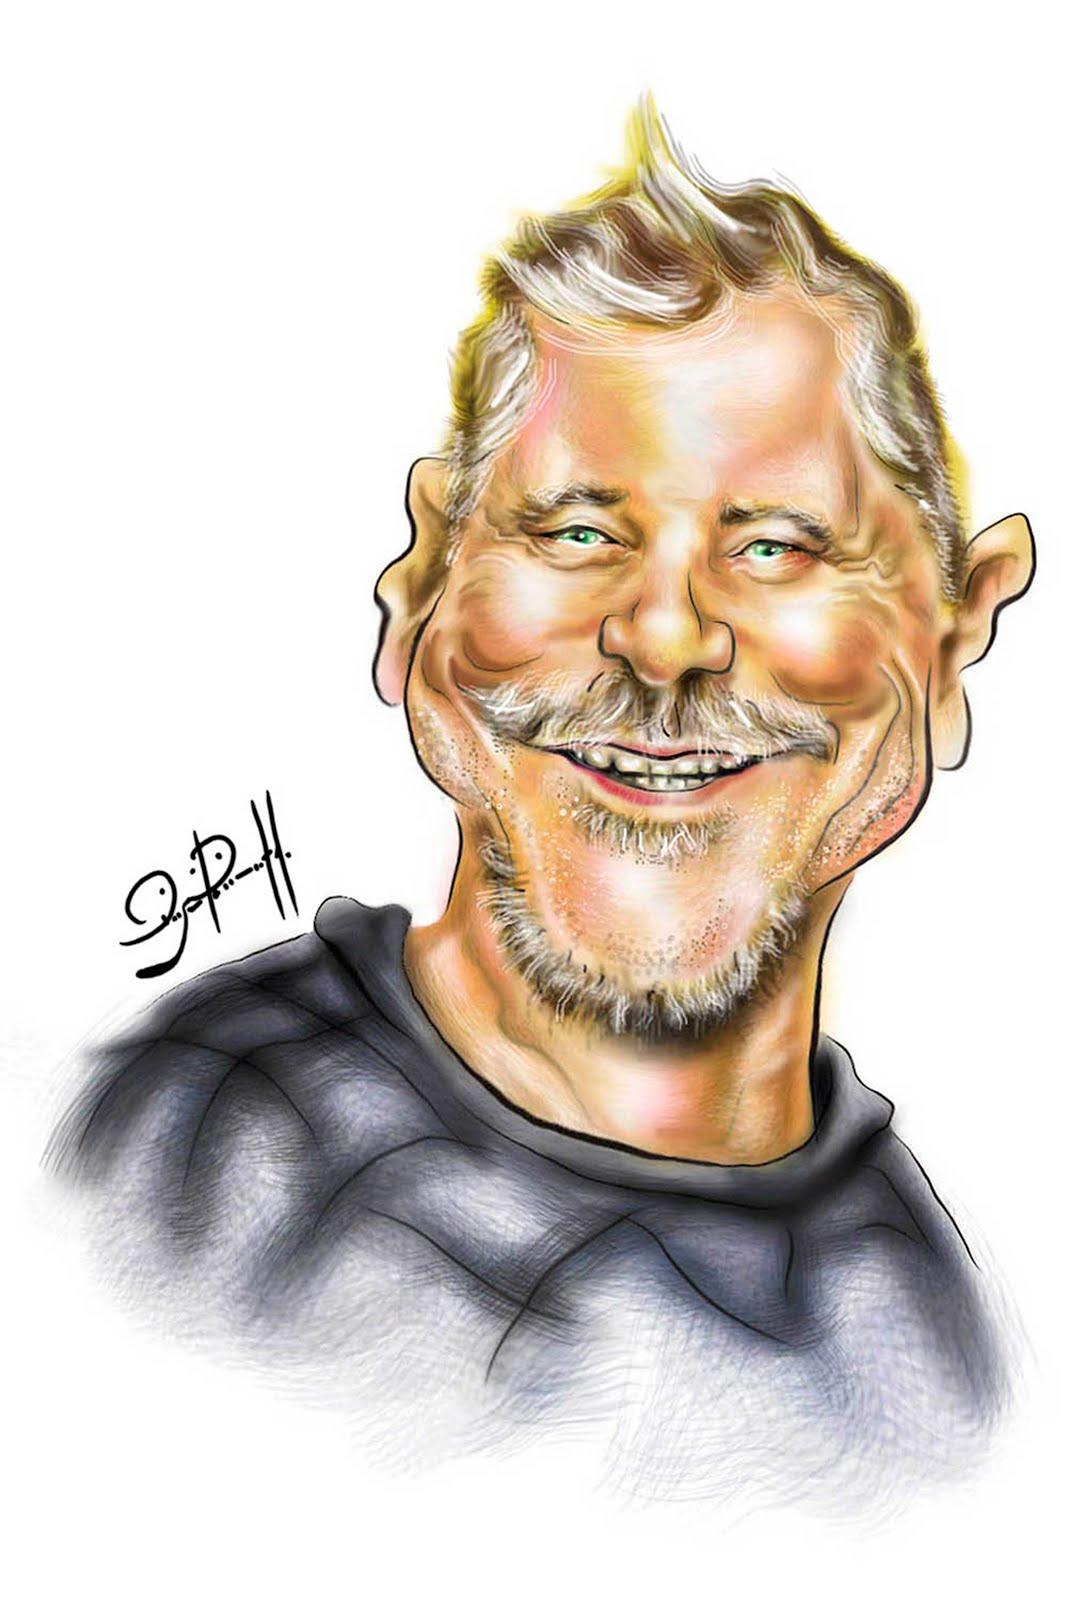 Artista Miguel Falabella_caricatura digital